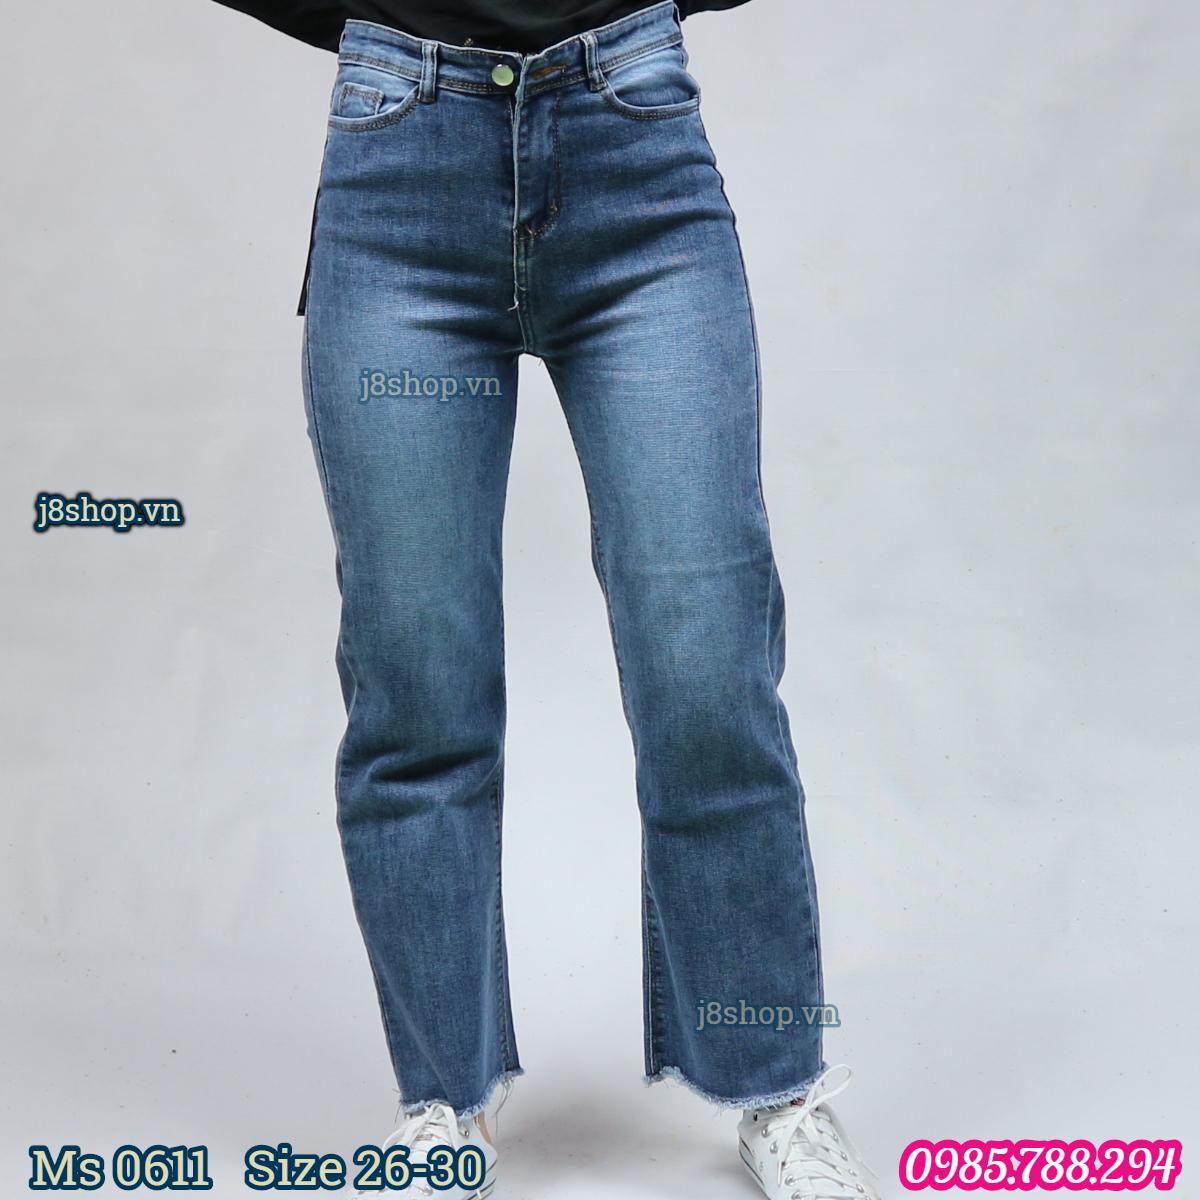 Quần Jean Nữ Ống Suông Lưng Cao Tua Lai Màu Xanh Size 26 30 Ms 0611